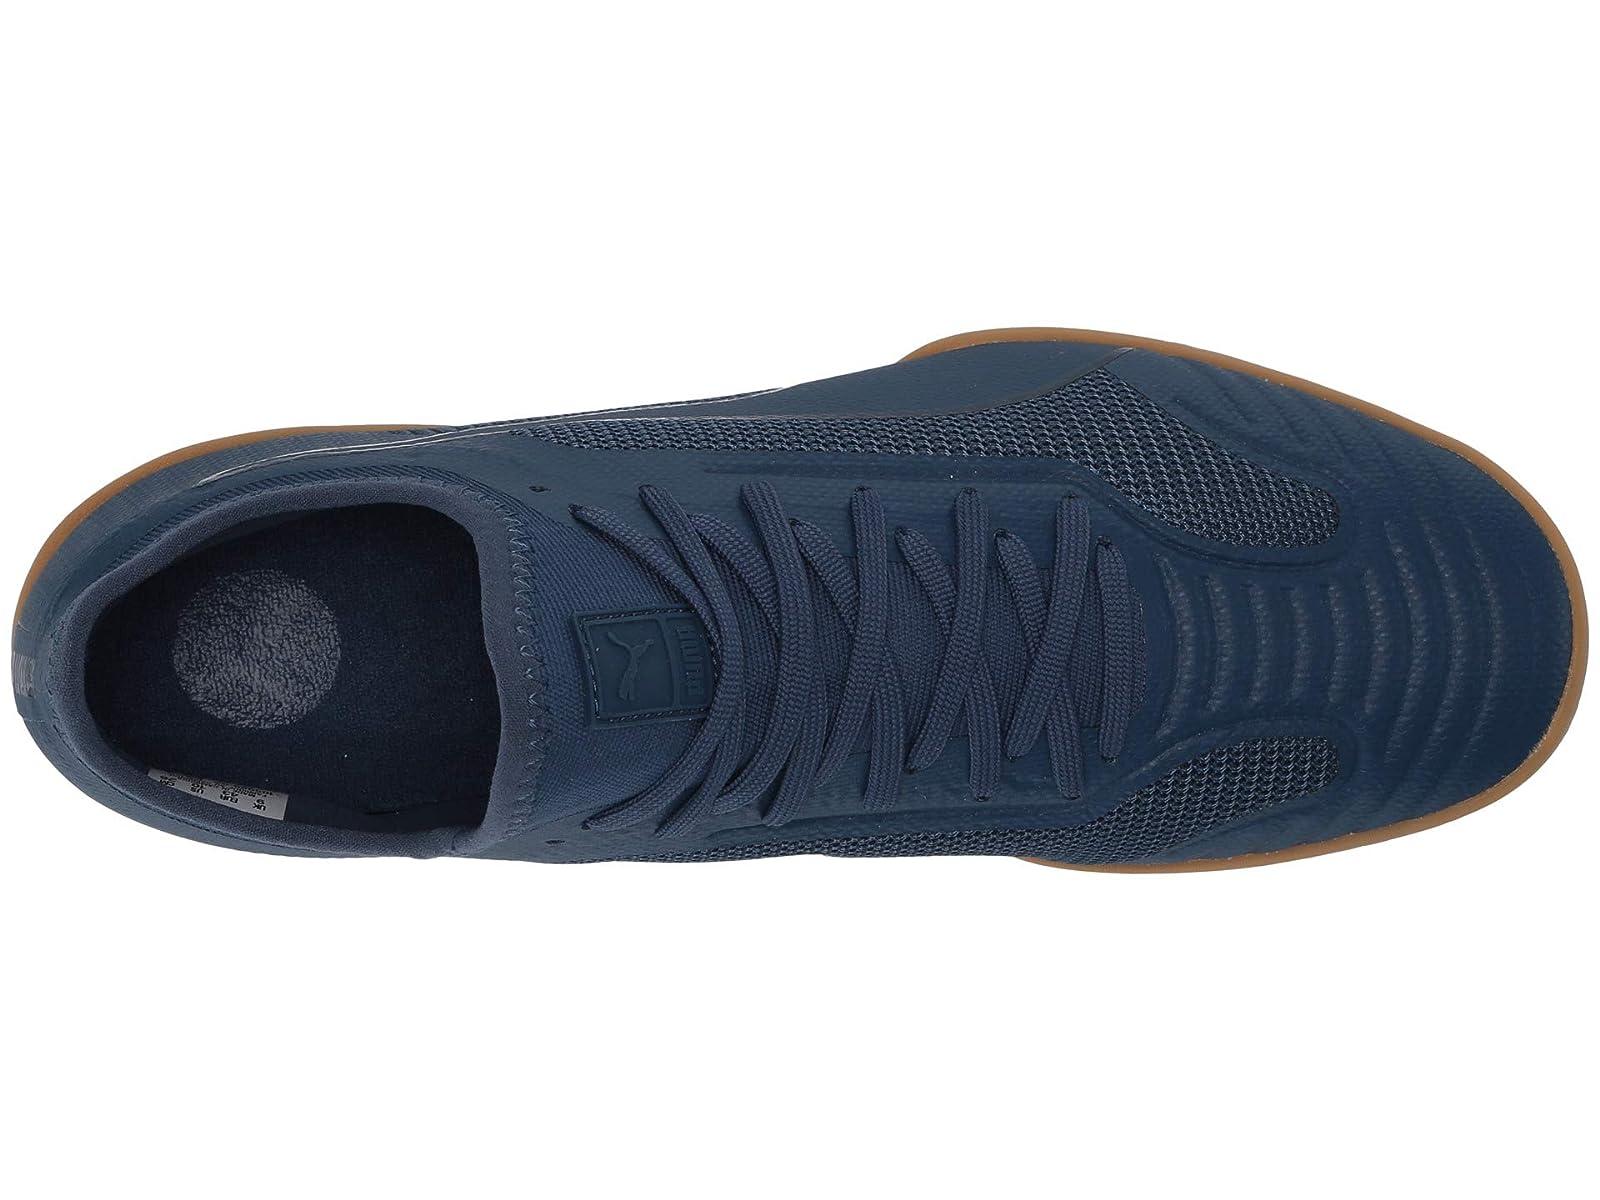 Man-039-s-Sneakers-amp-Athletic-Shoes-PUMA-365-Sala-1 thumbnail 3